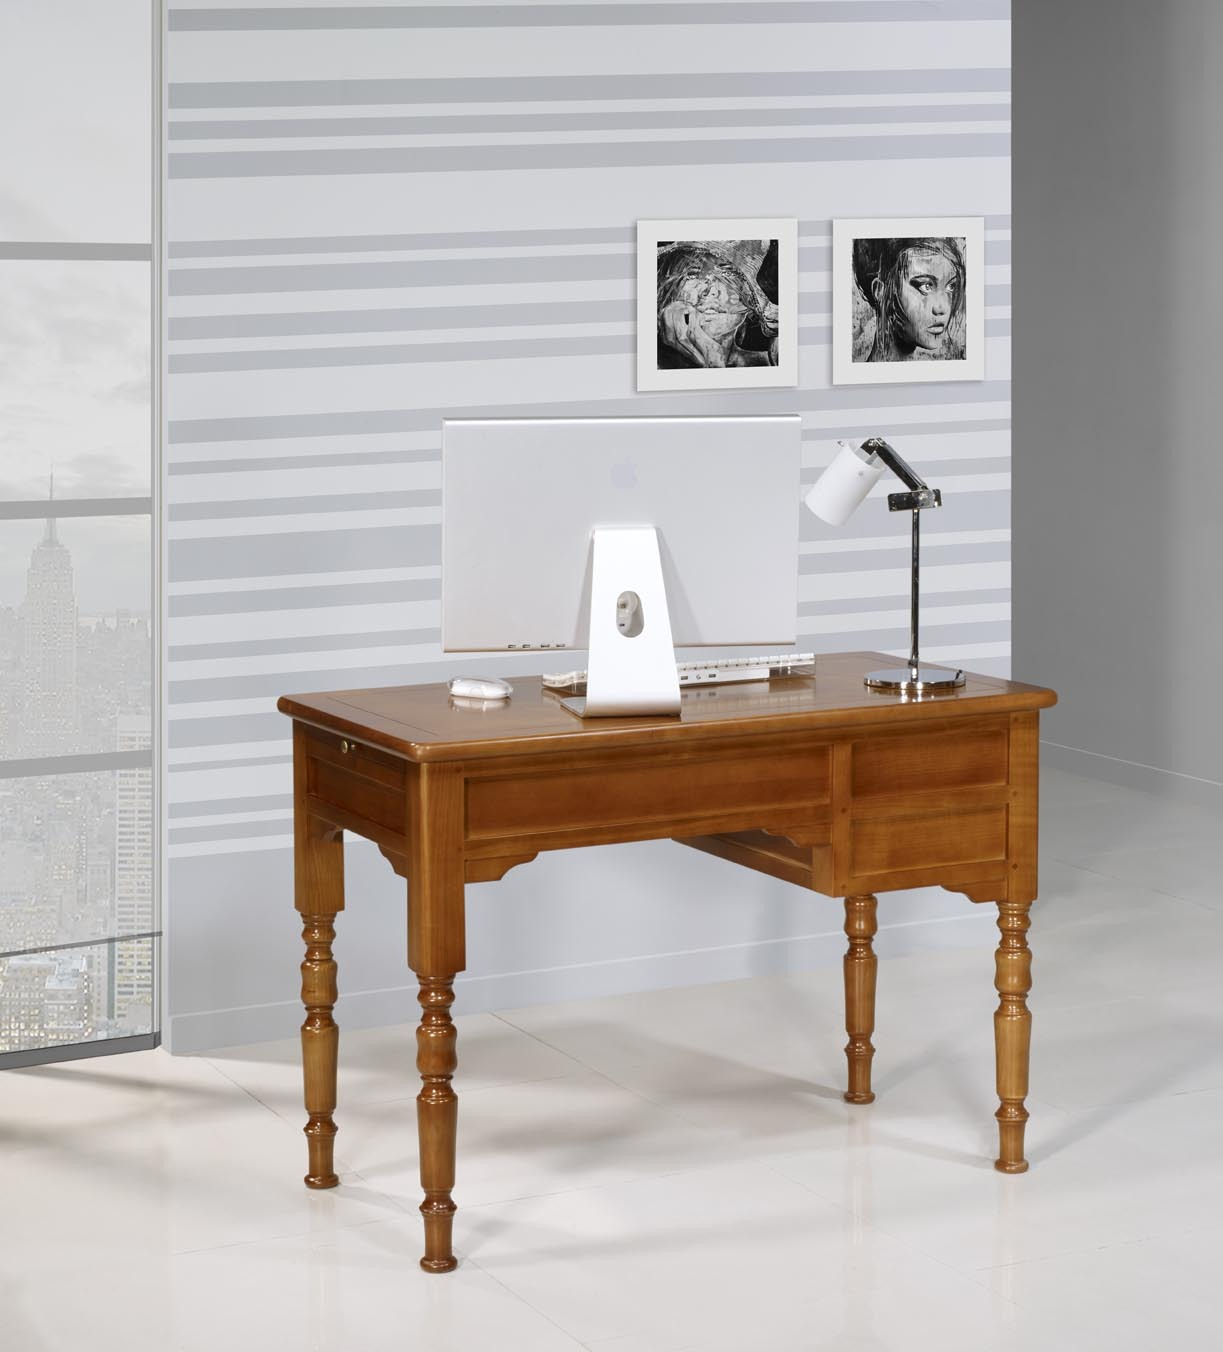 Mesa escritorio r my en madera maciza de cerezo estilo - Escritorios madera maciza ...